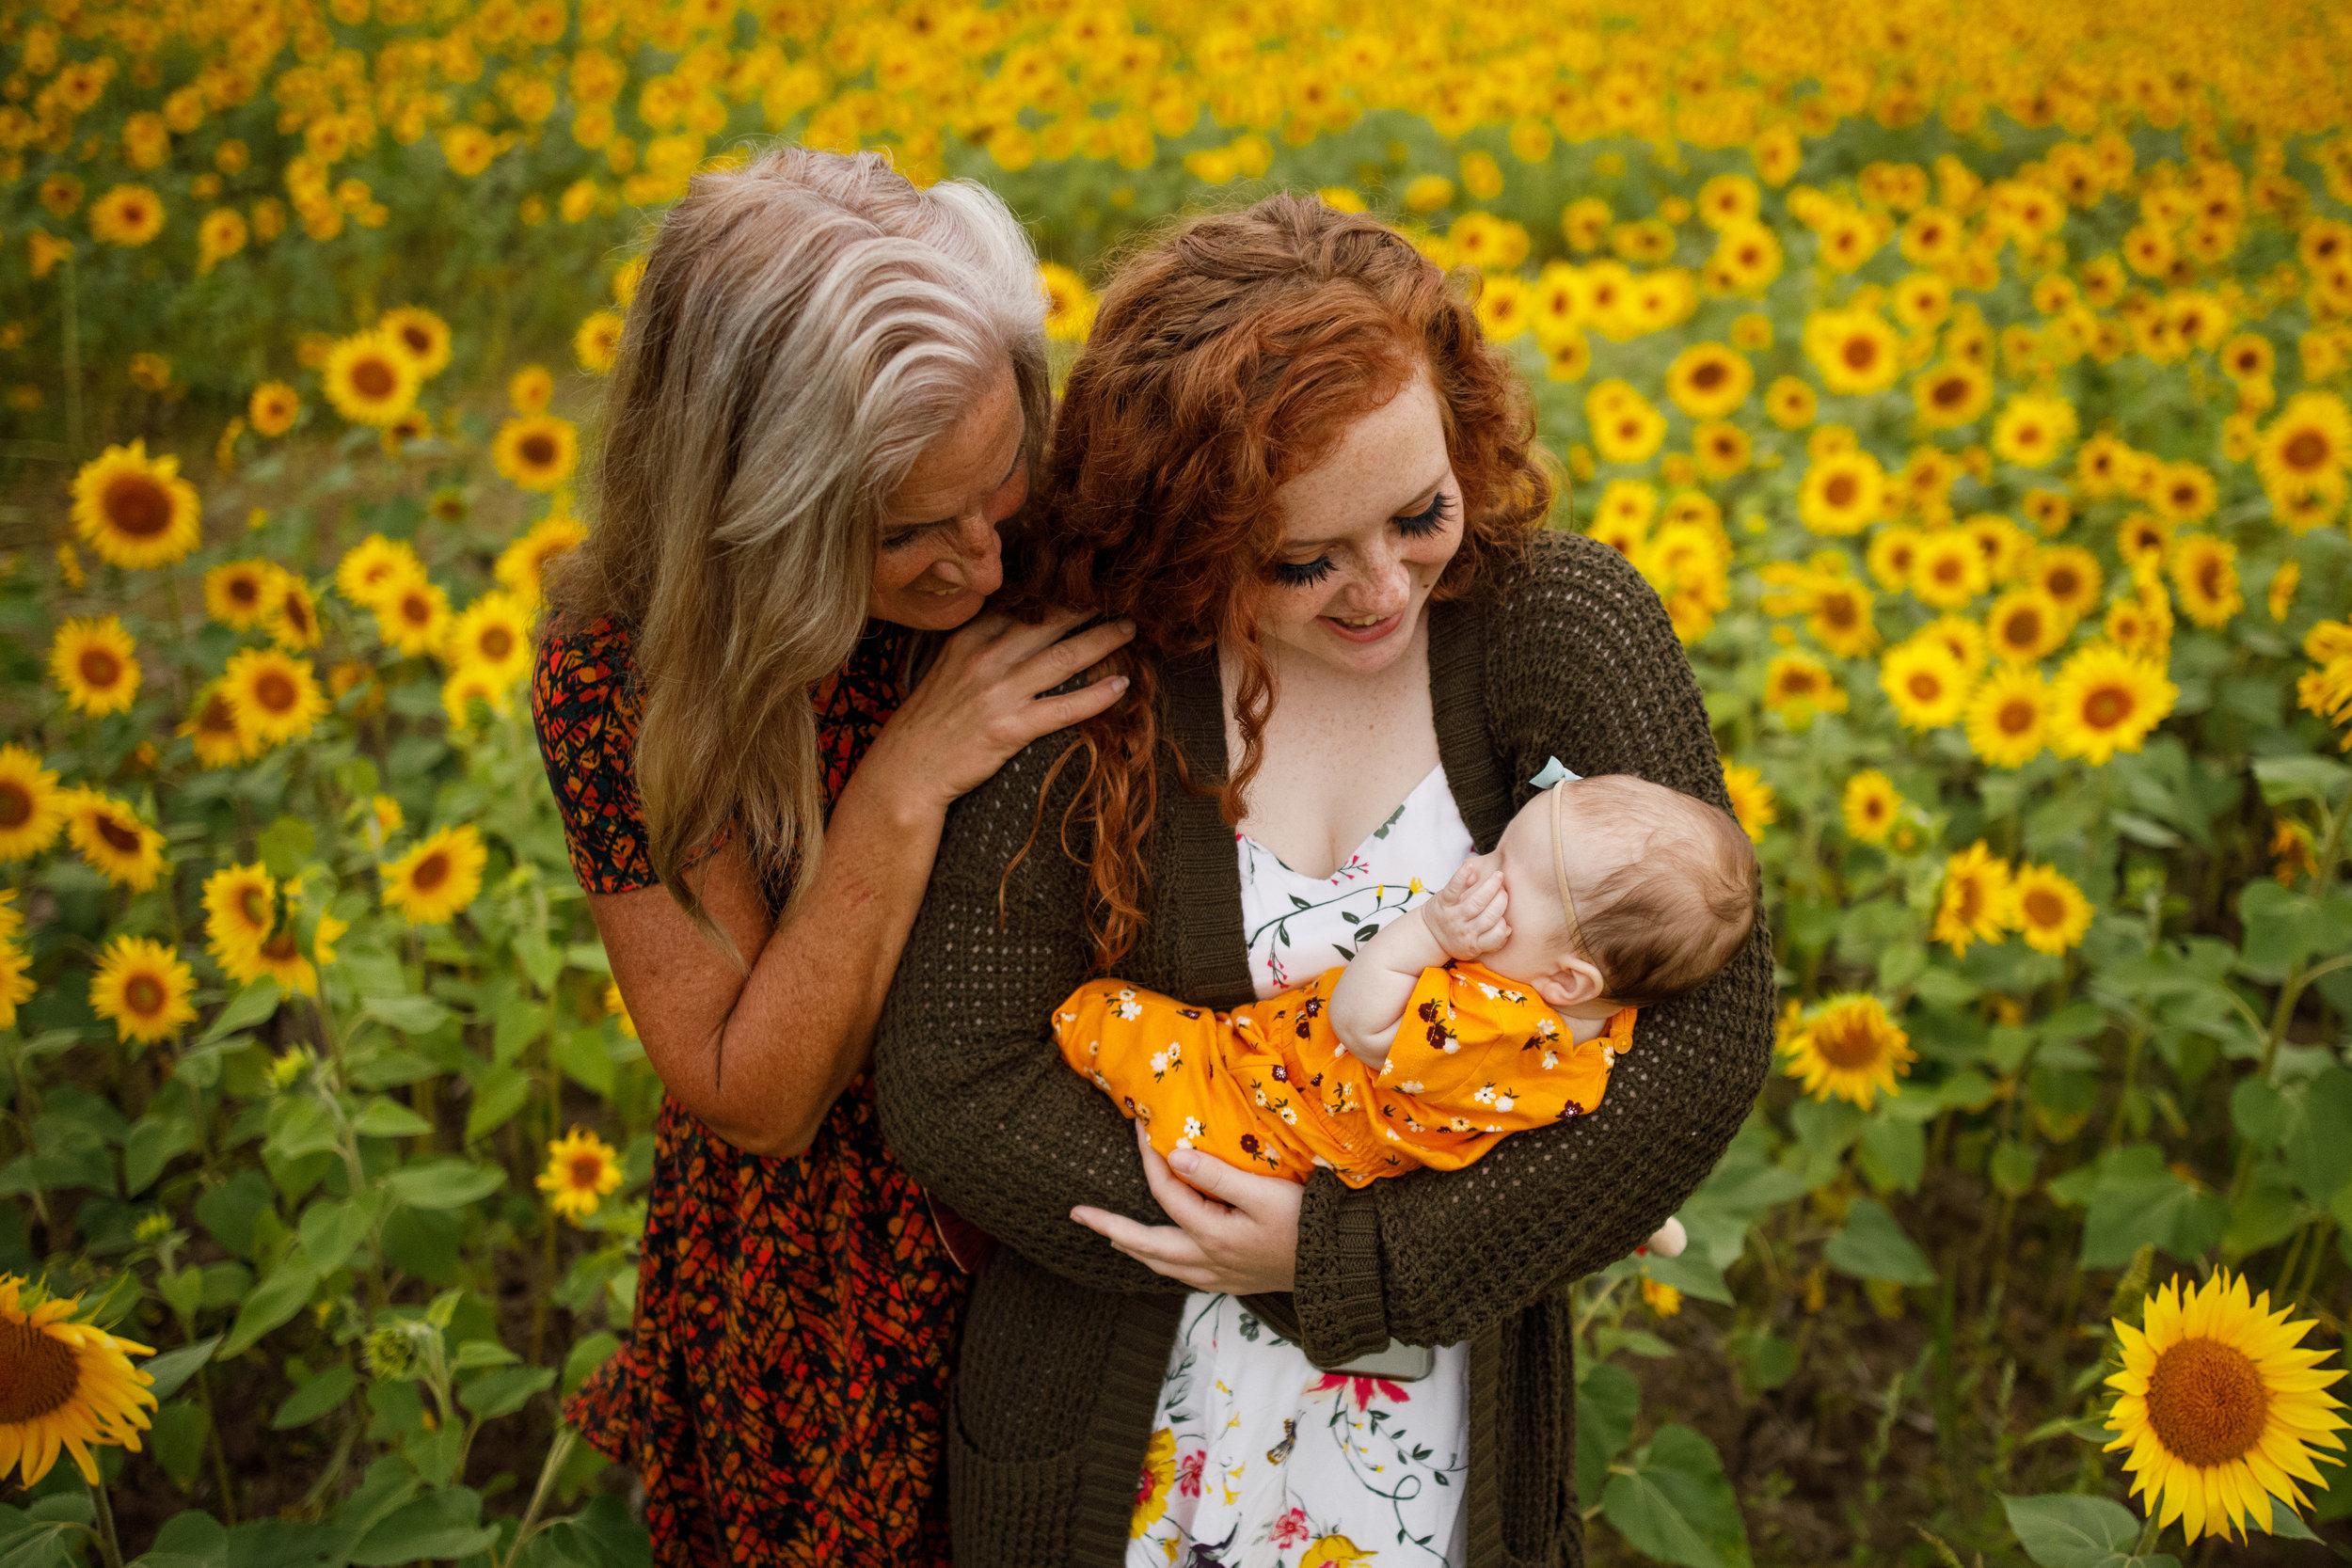 Morris Family Summer 2019 - Grand Rapids Photographer - Grand Rapids Family Photographer - Ed Dunneback and Girls - J Darling Photo 045.jpg